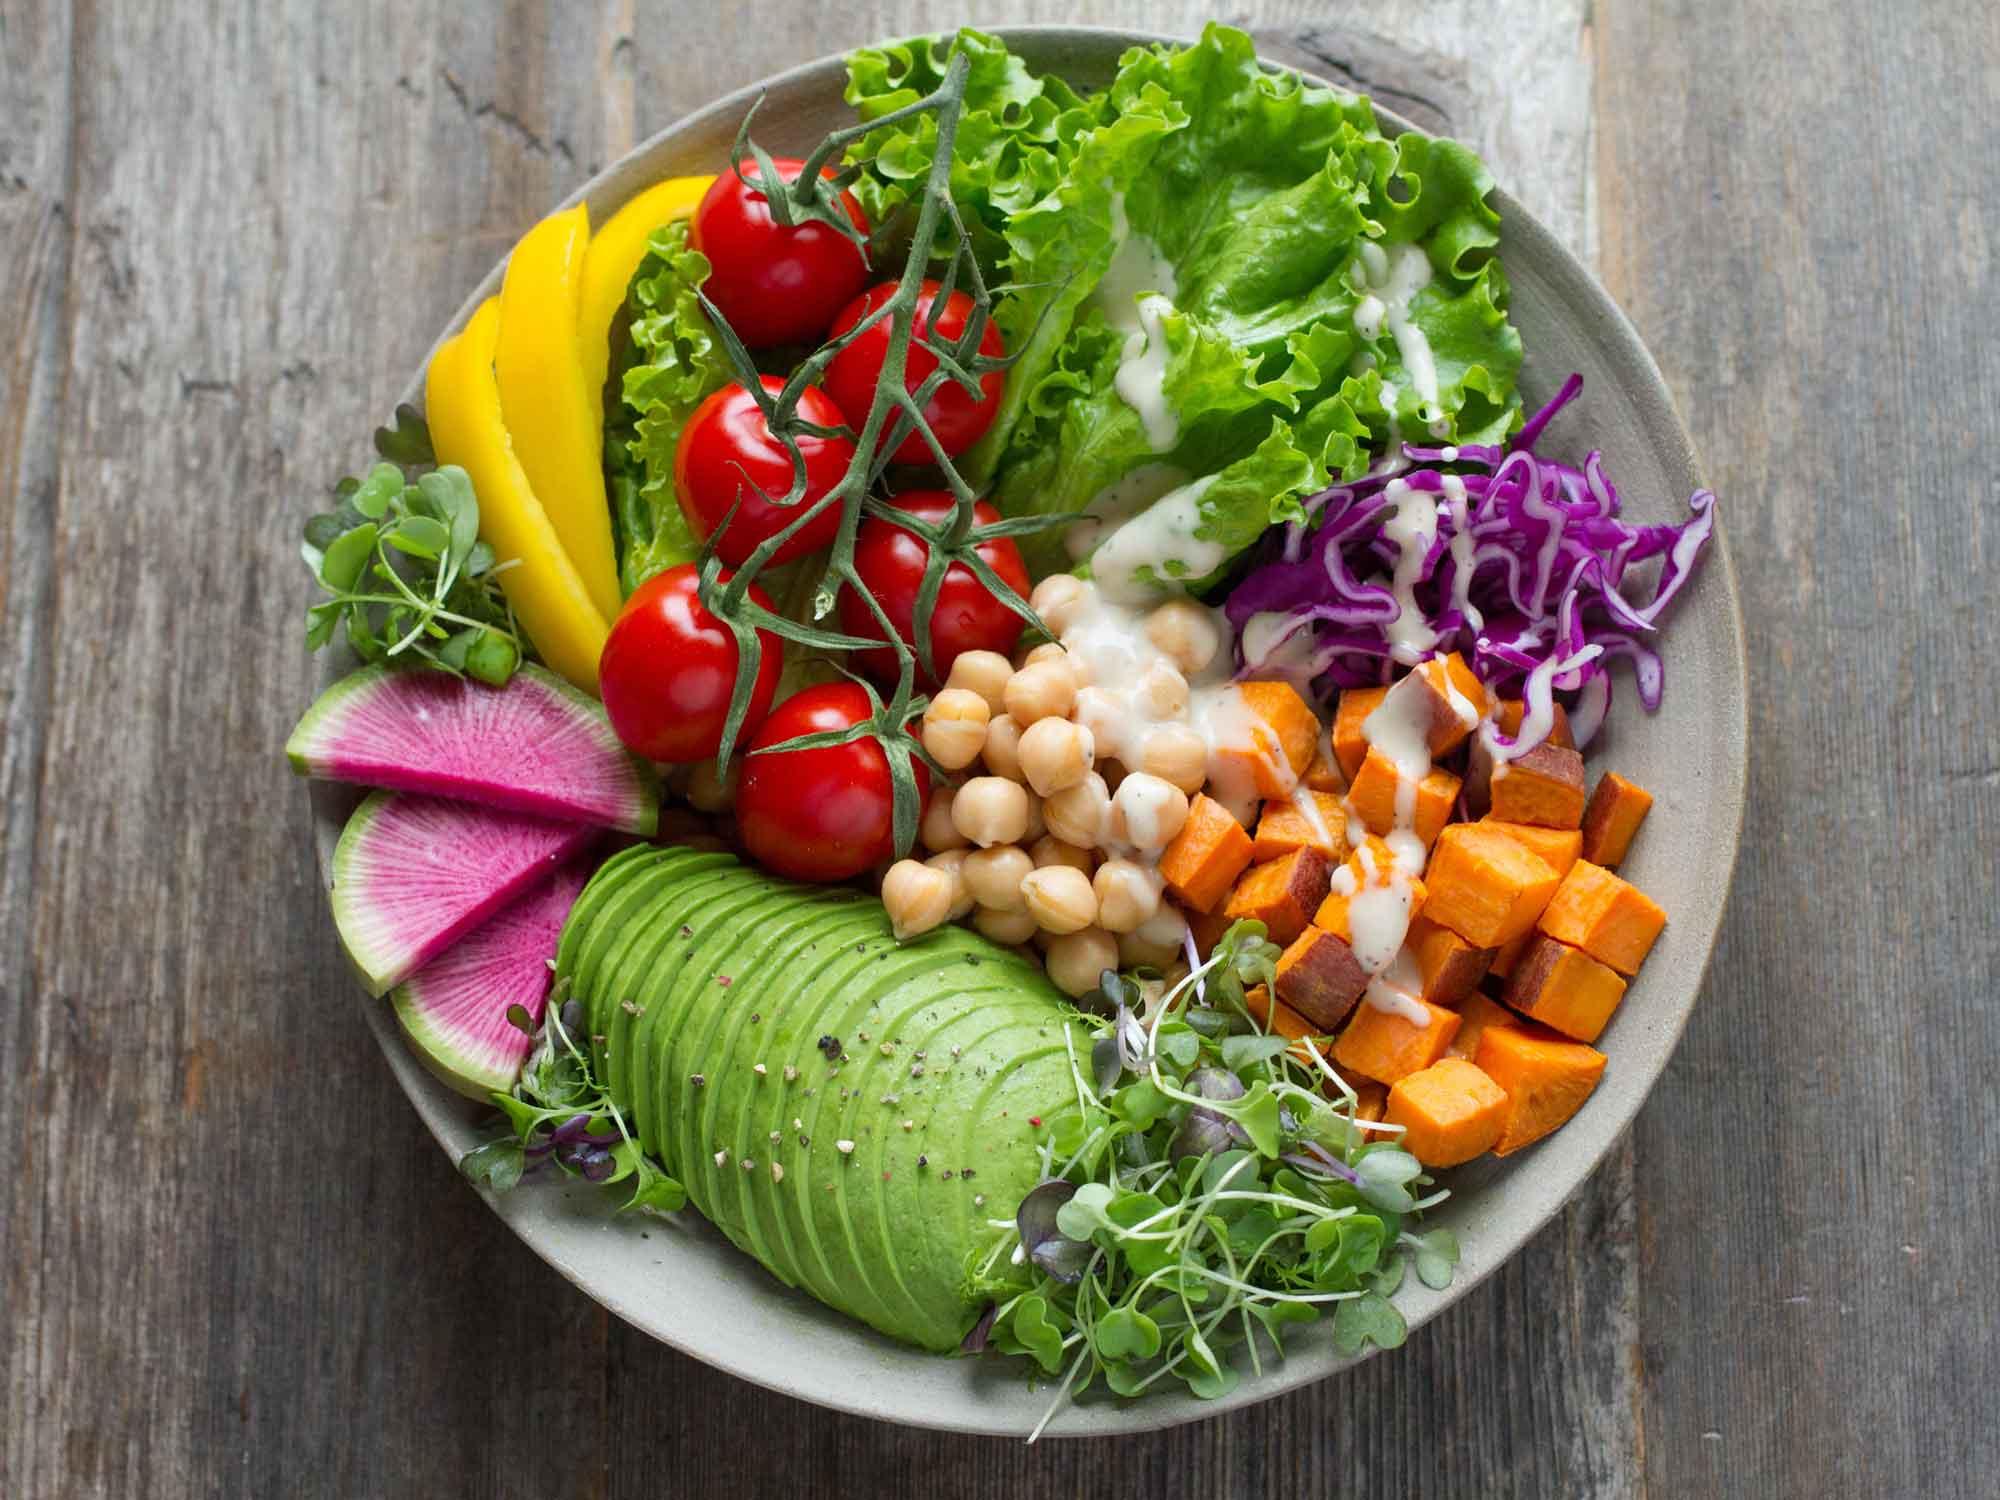 Food et communication - les tendances du moment - Agence Sharing